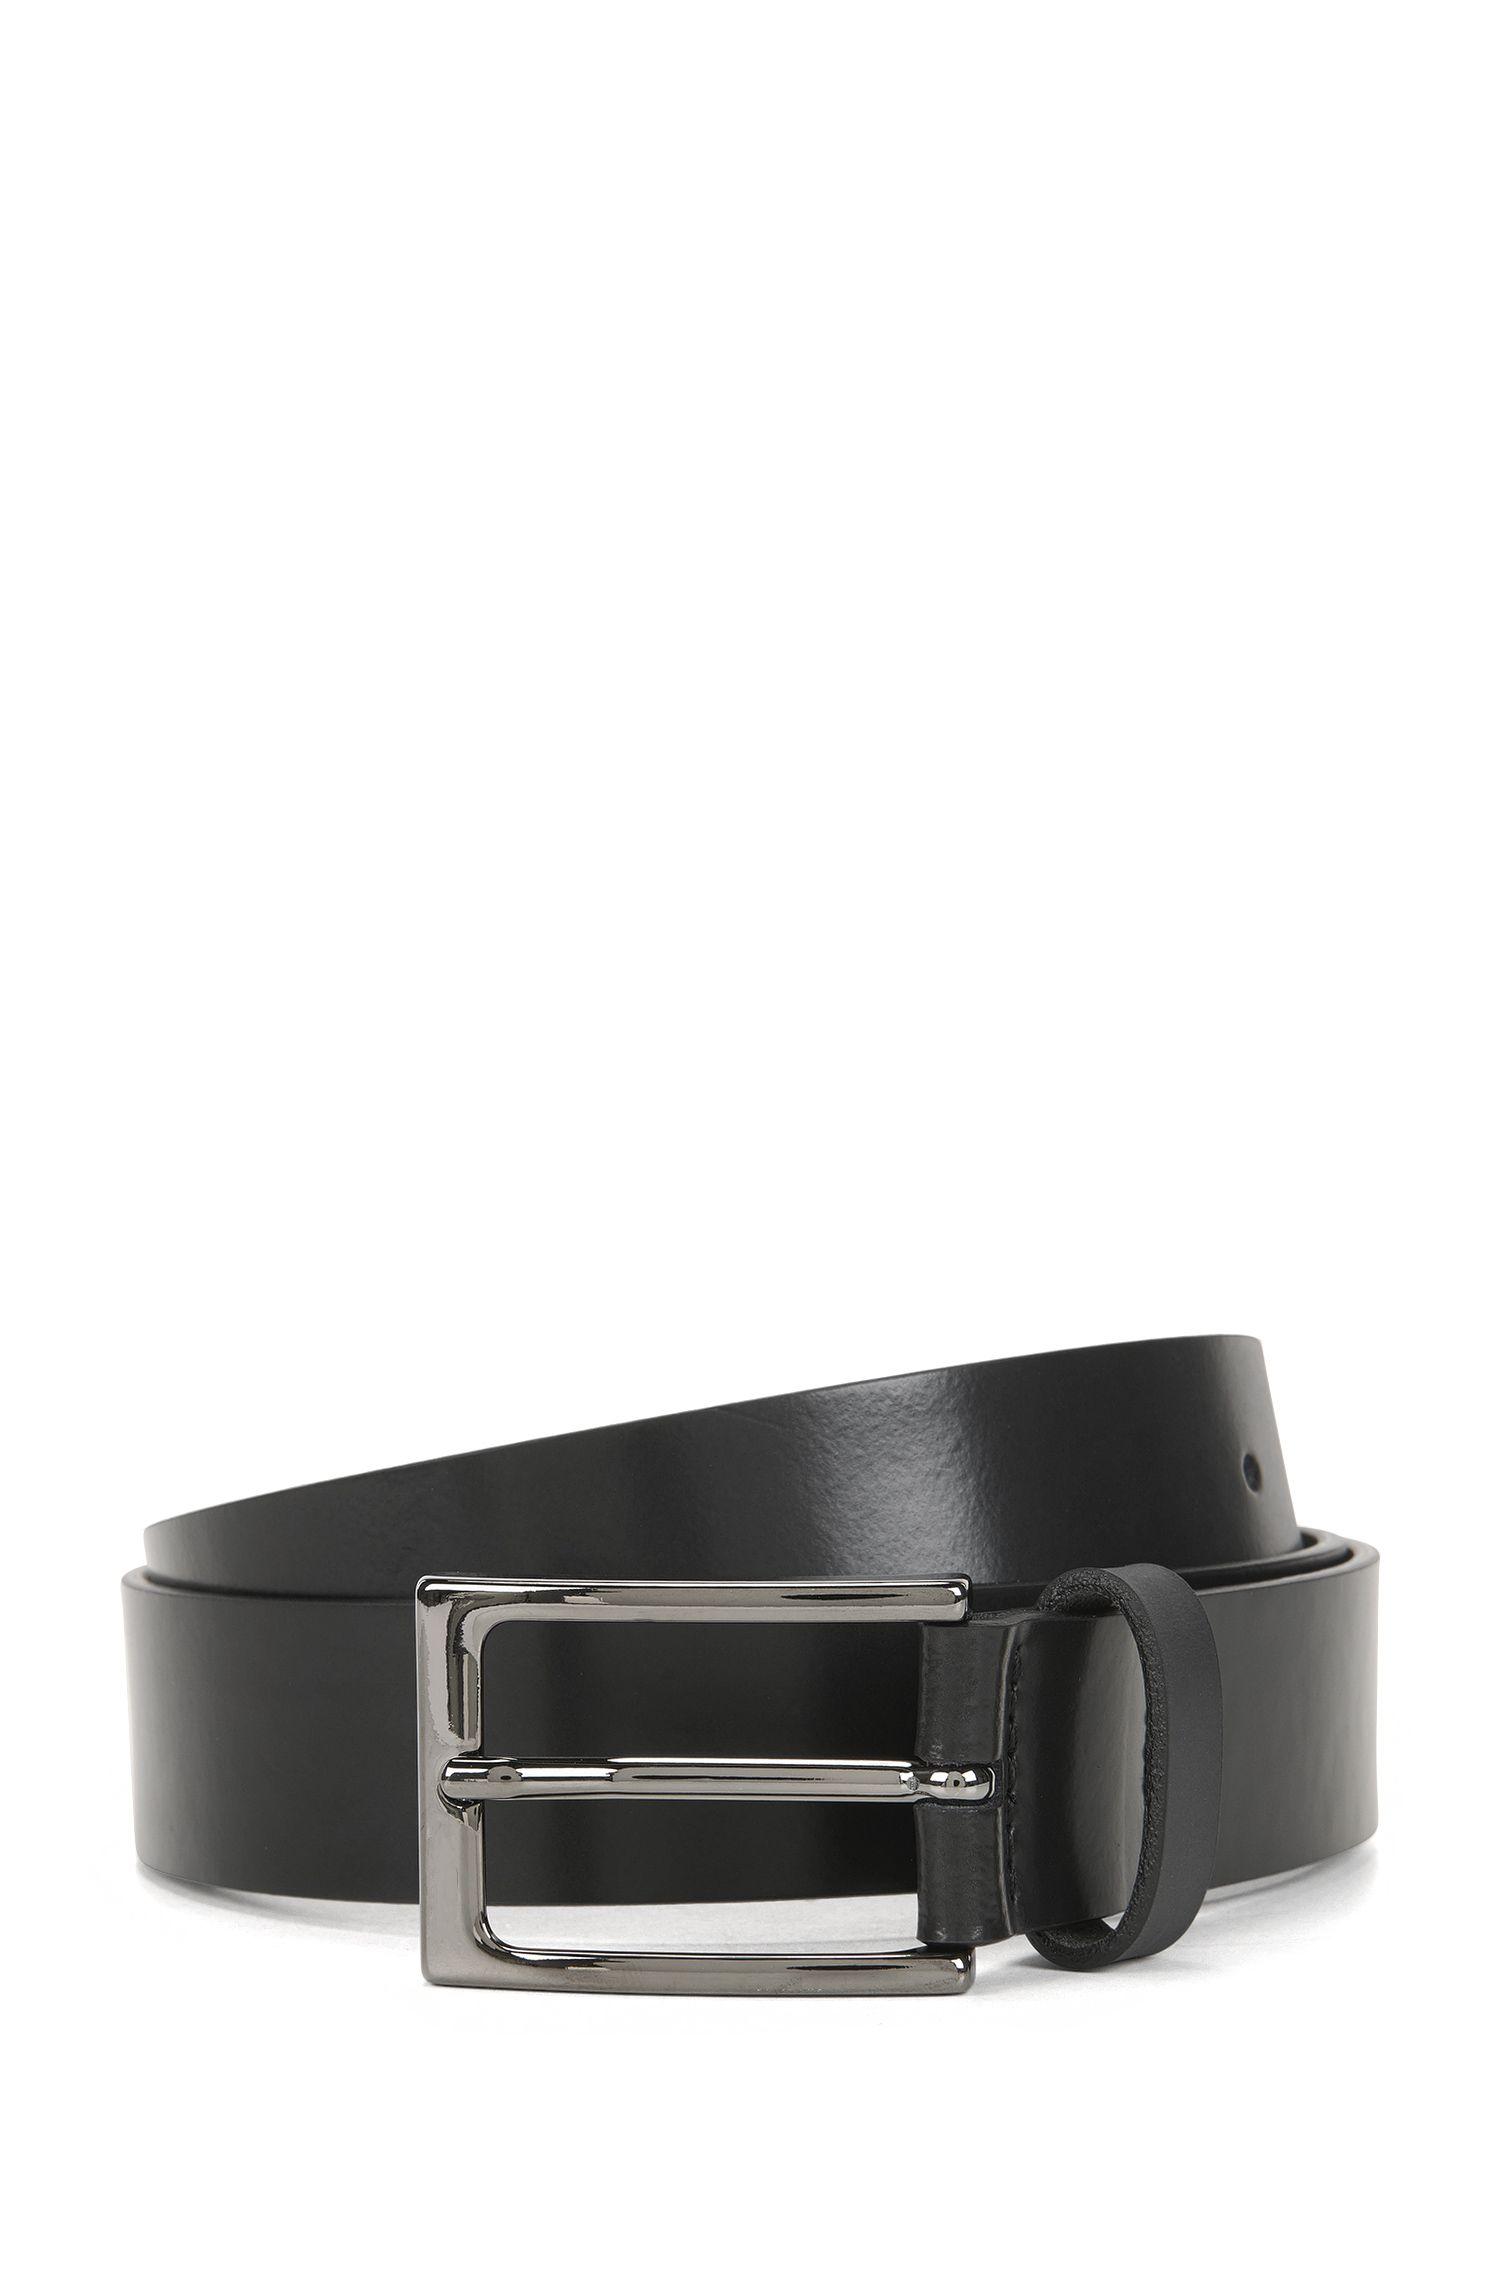 Matt leather belt with polished gunmetal pin buckle